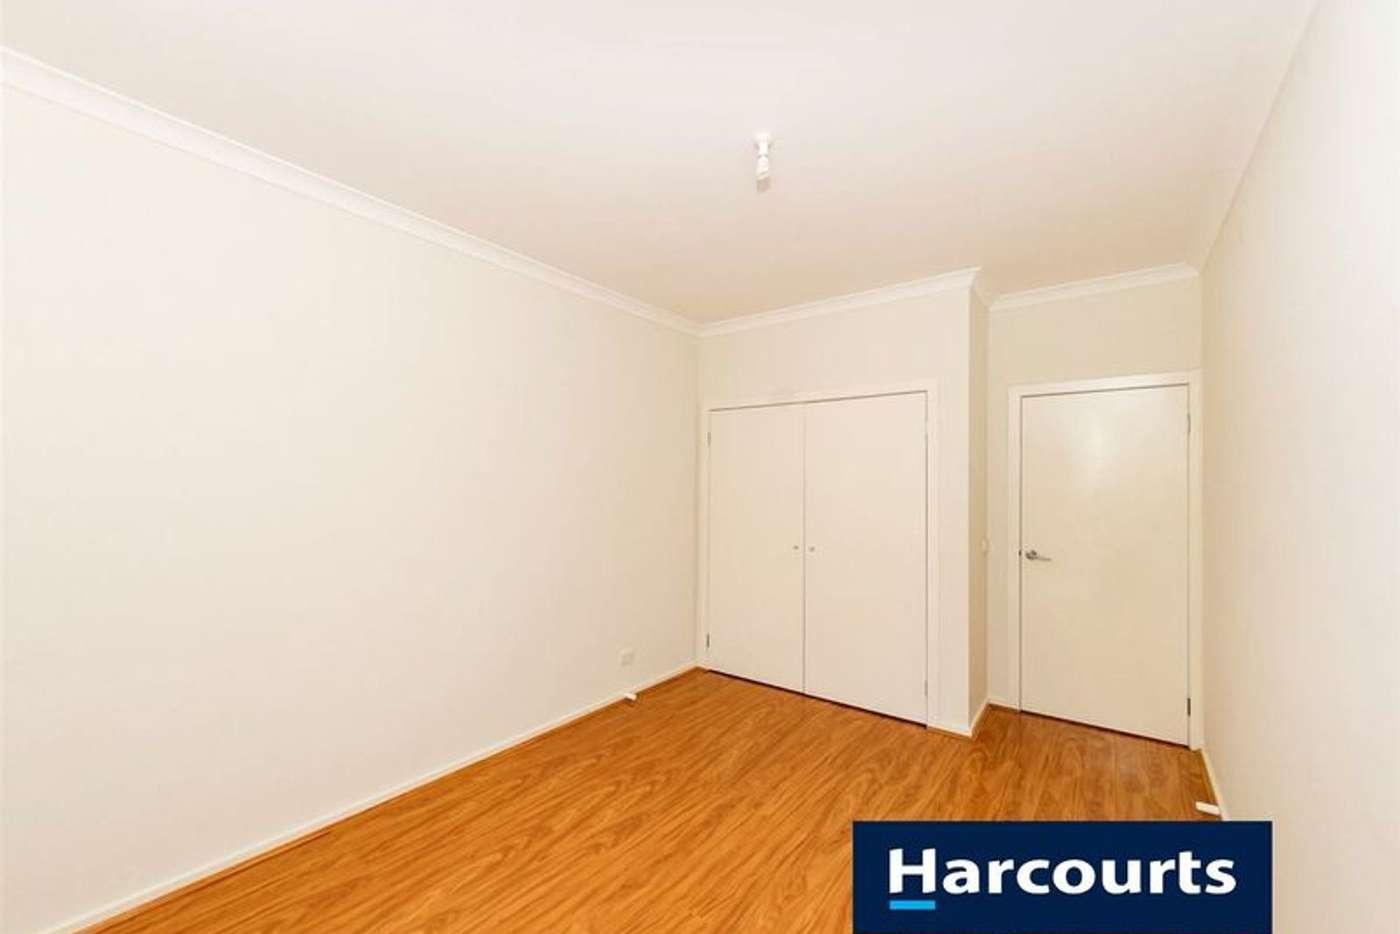 Seventh view of Homely house listing, 7 Heathcote Retreat, Caroline Springs VIC 3023